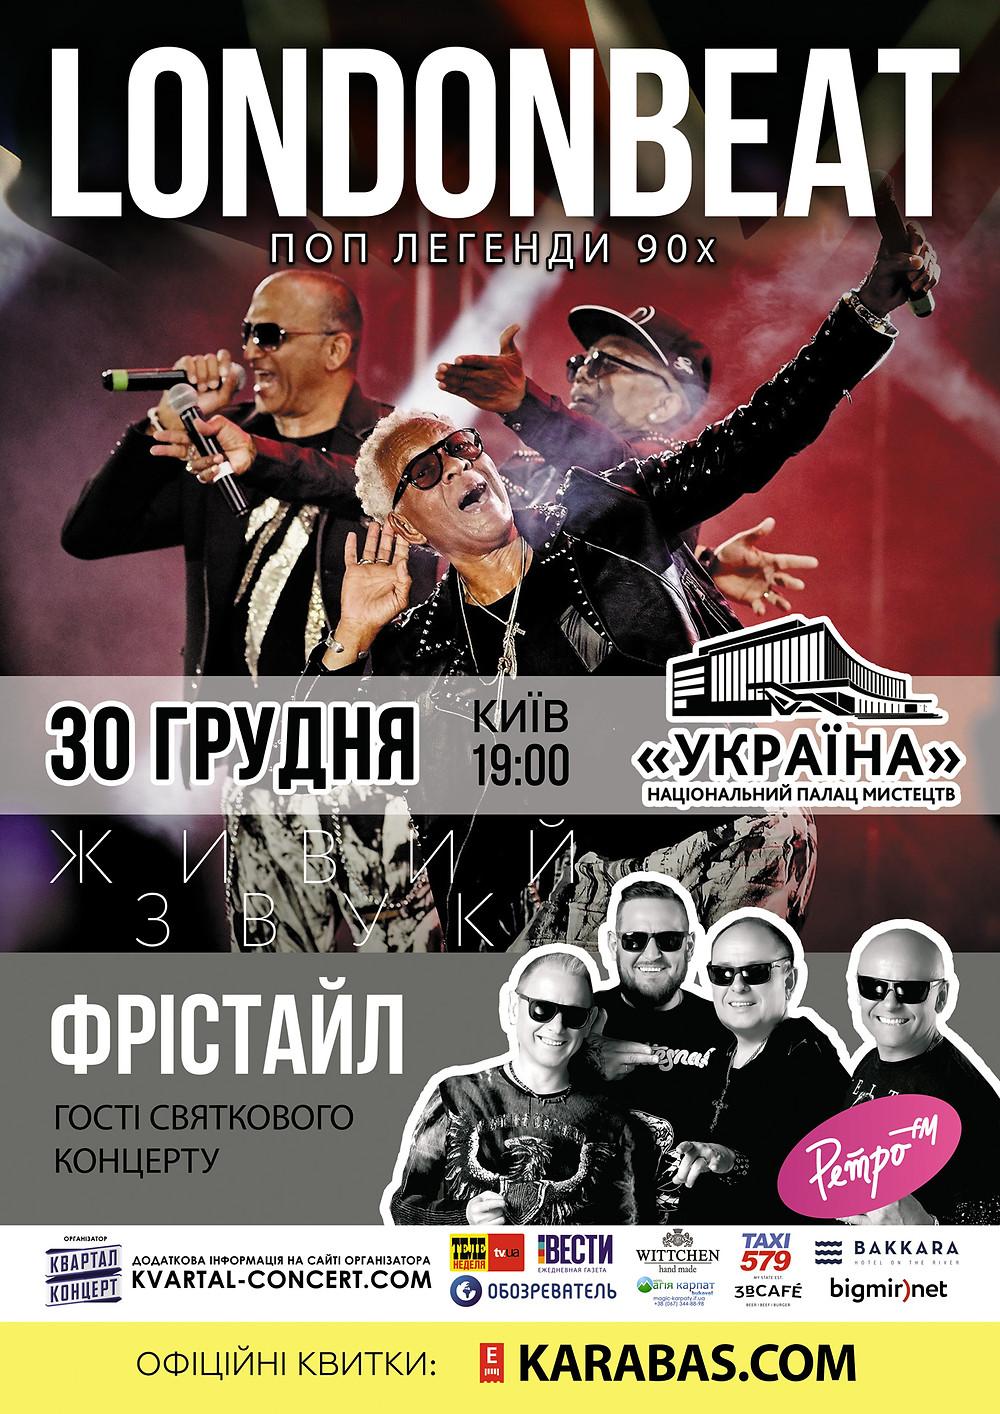 LONDONBEAT New Year Show, Kiev 30.12.18